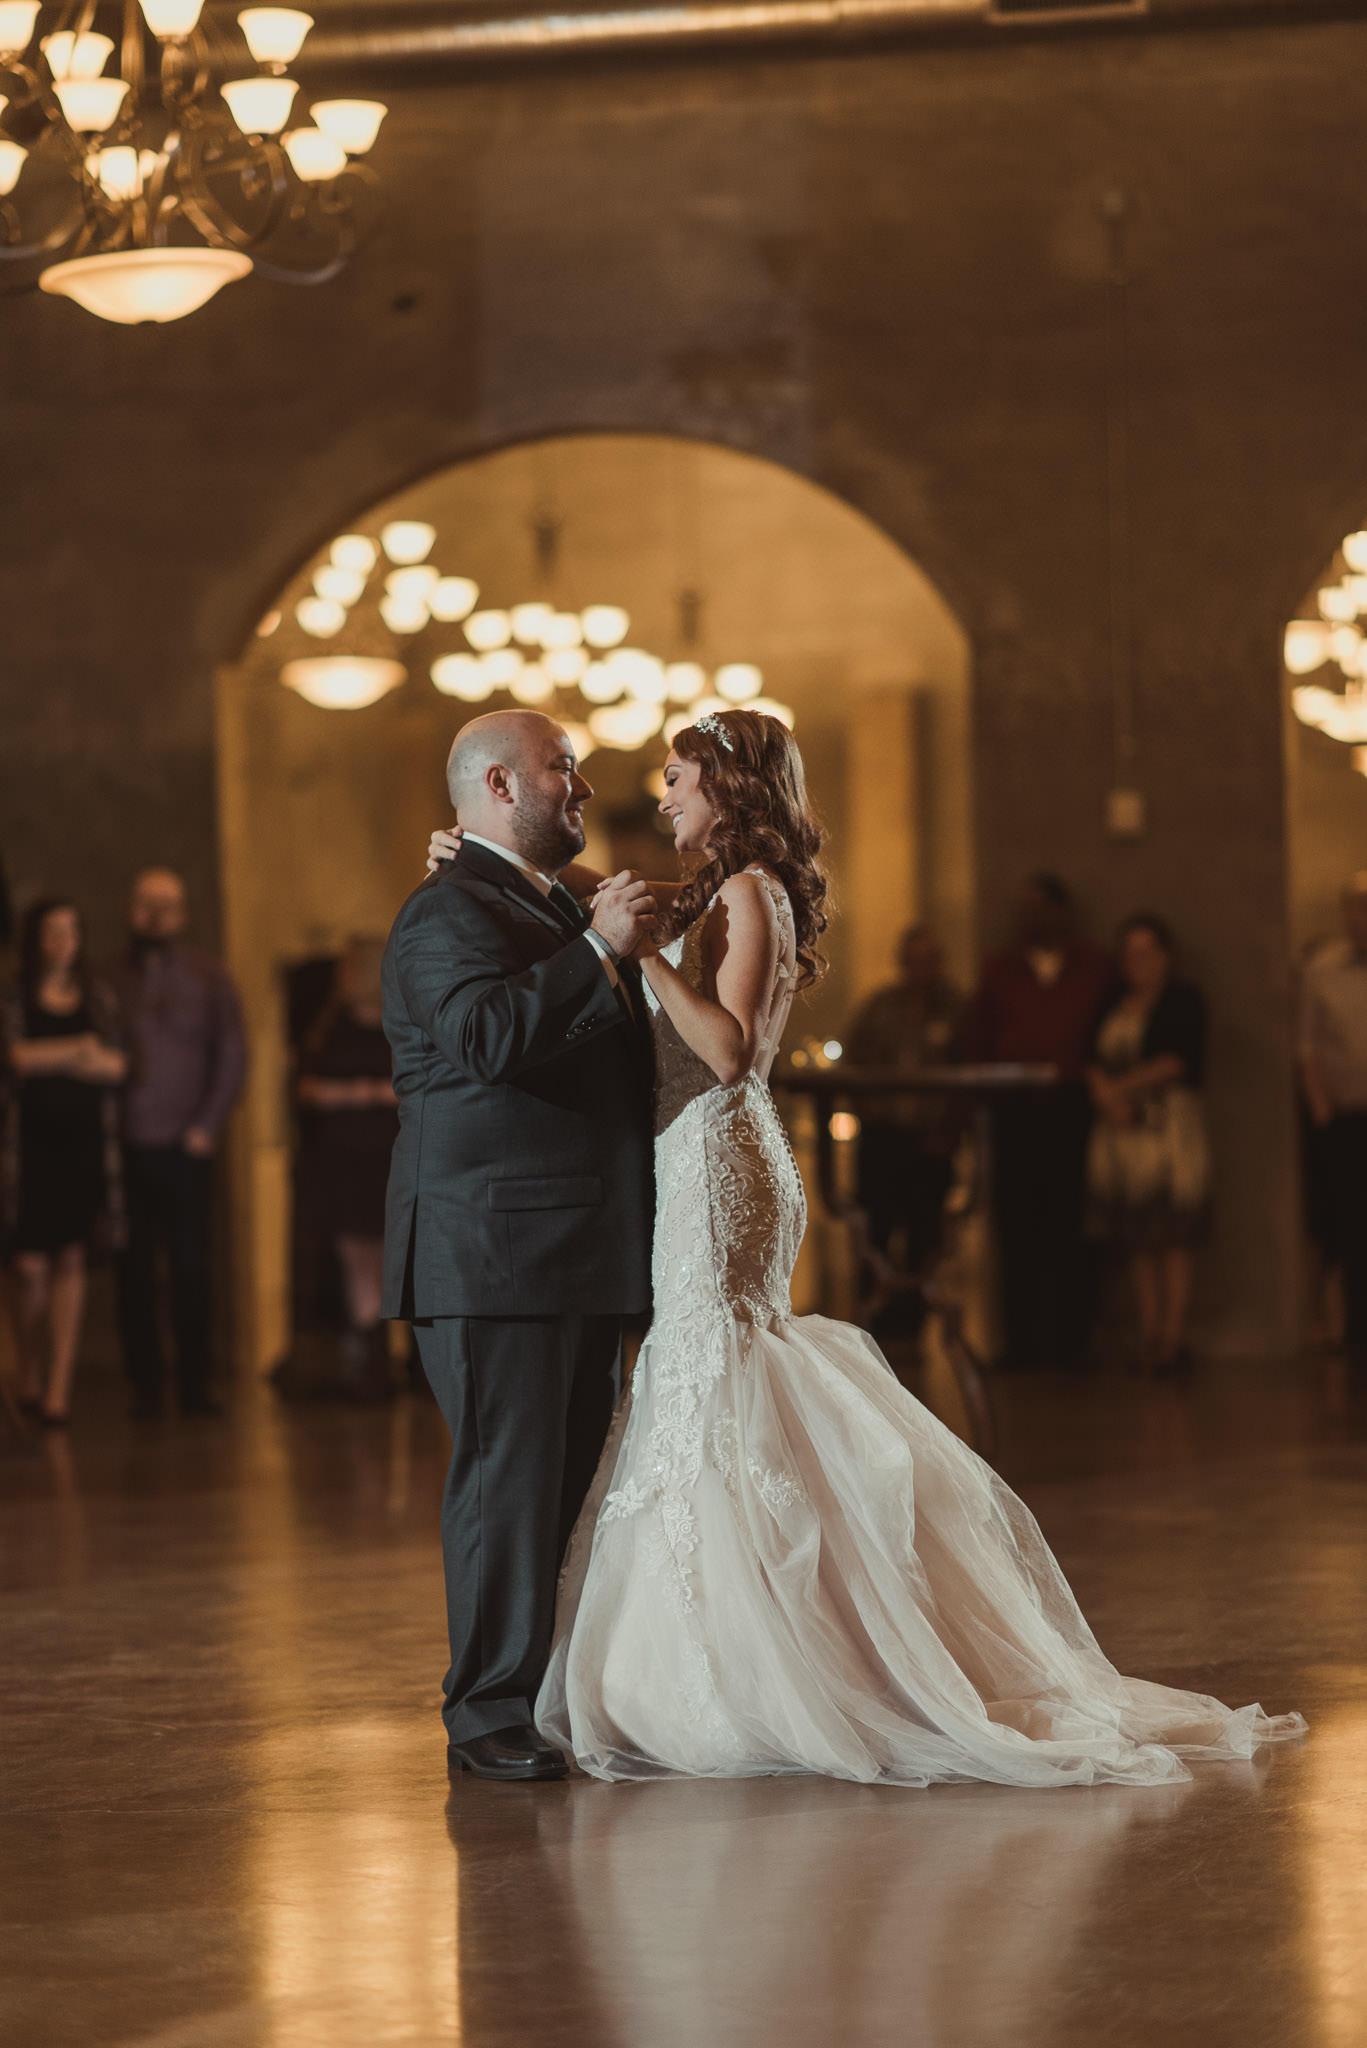 Cynthia-Curtis-Olde-Dobbine-Station-Houston-Wedding-Photographer-sm-89.jpg